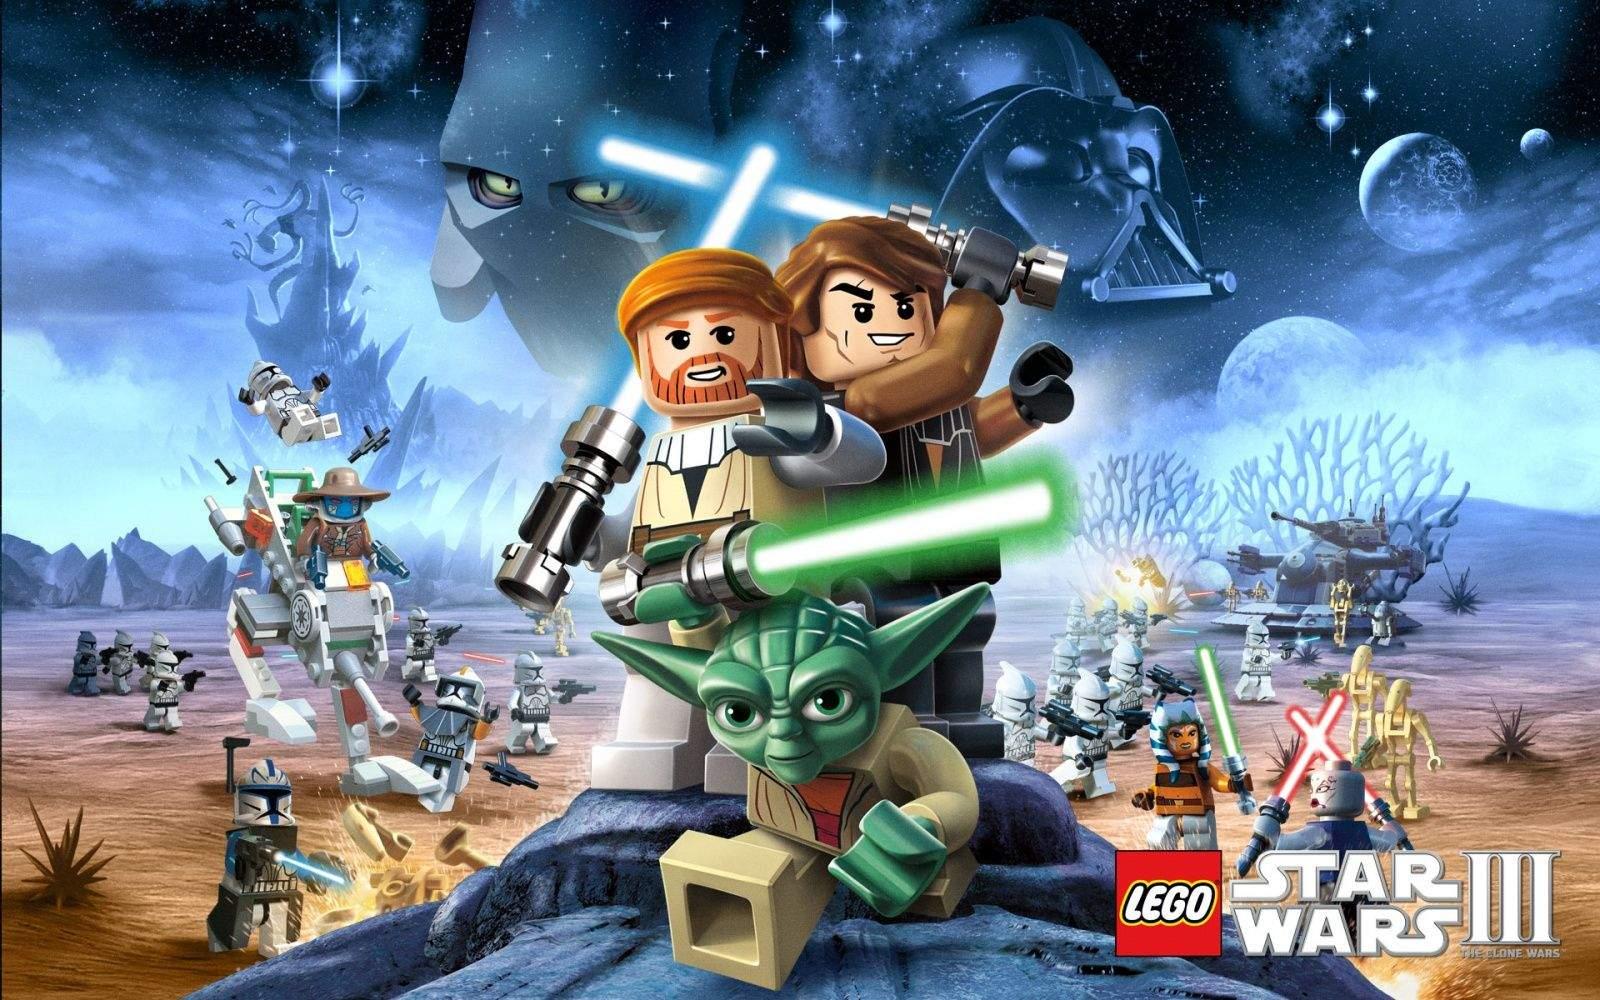 LEGO-Star-Wars-III-The-Clone-Wars